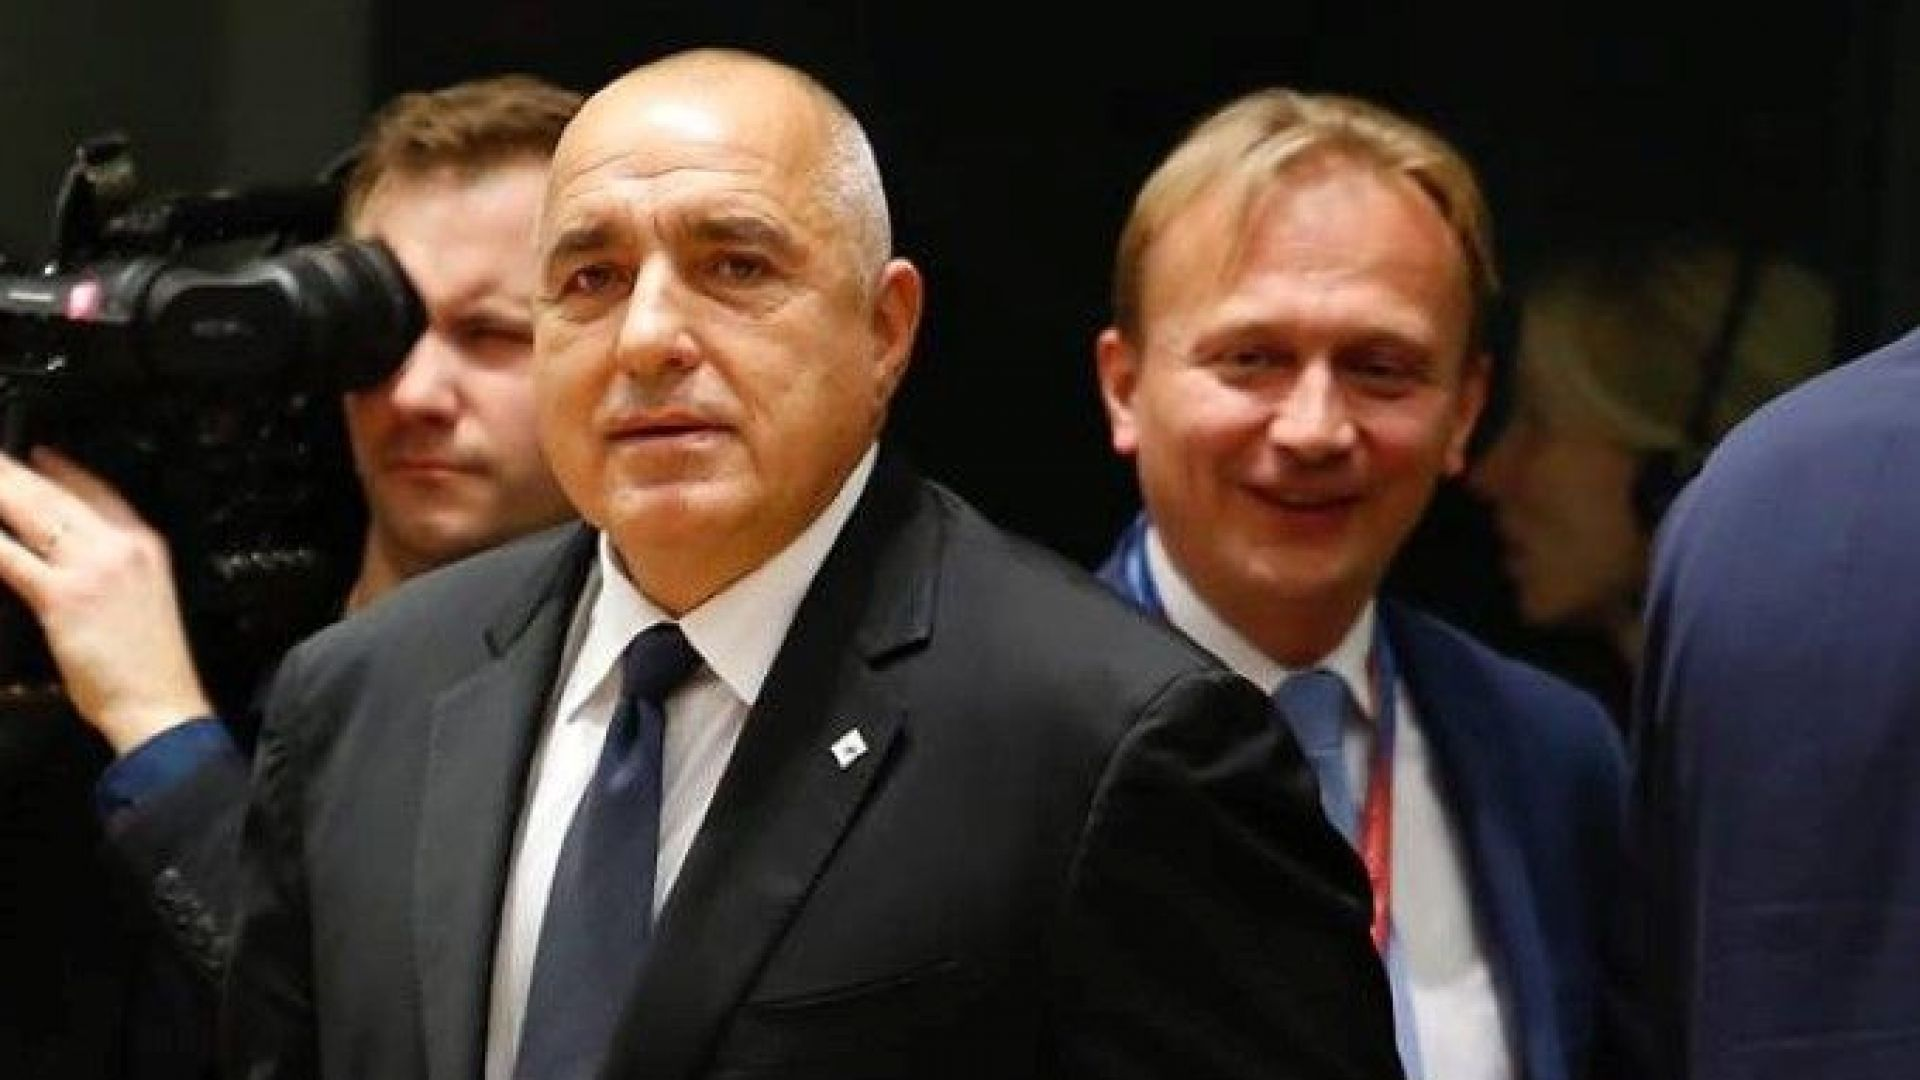 Борисов ще води преговори за нов договор за белодробни трансплантации във Виена